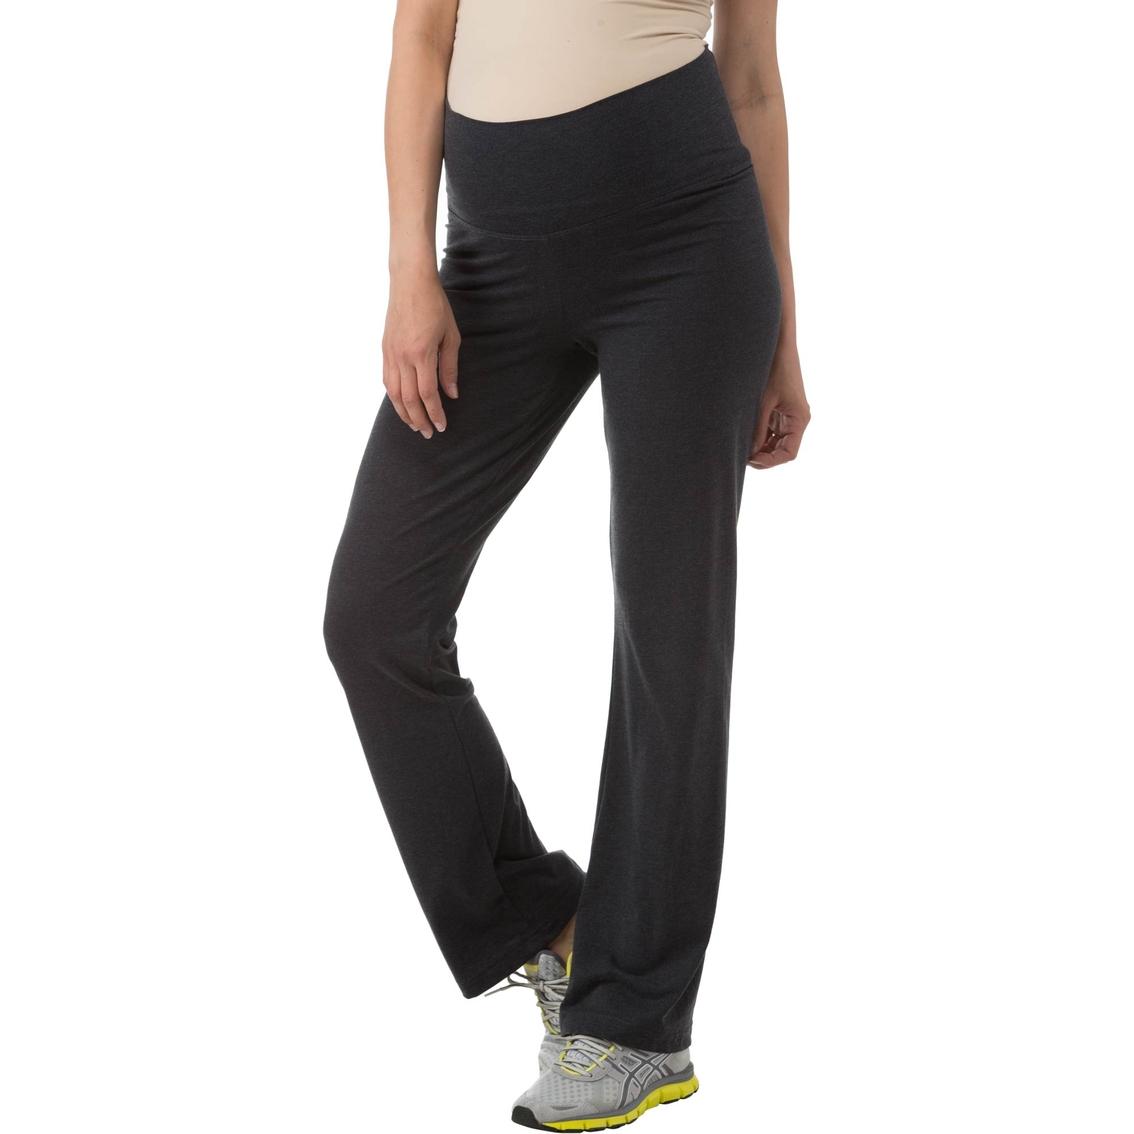 New Recruit Maternity Knit Yoga Pants